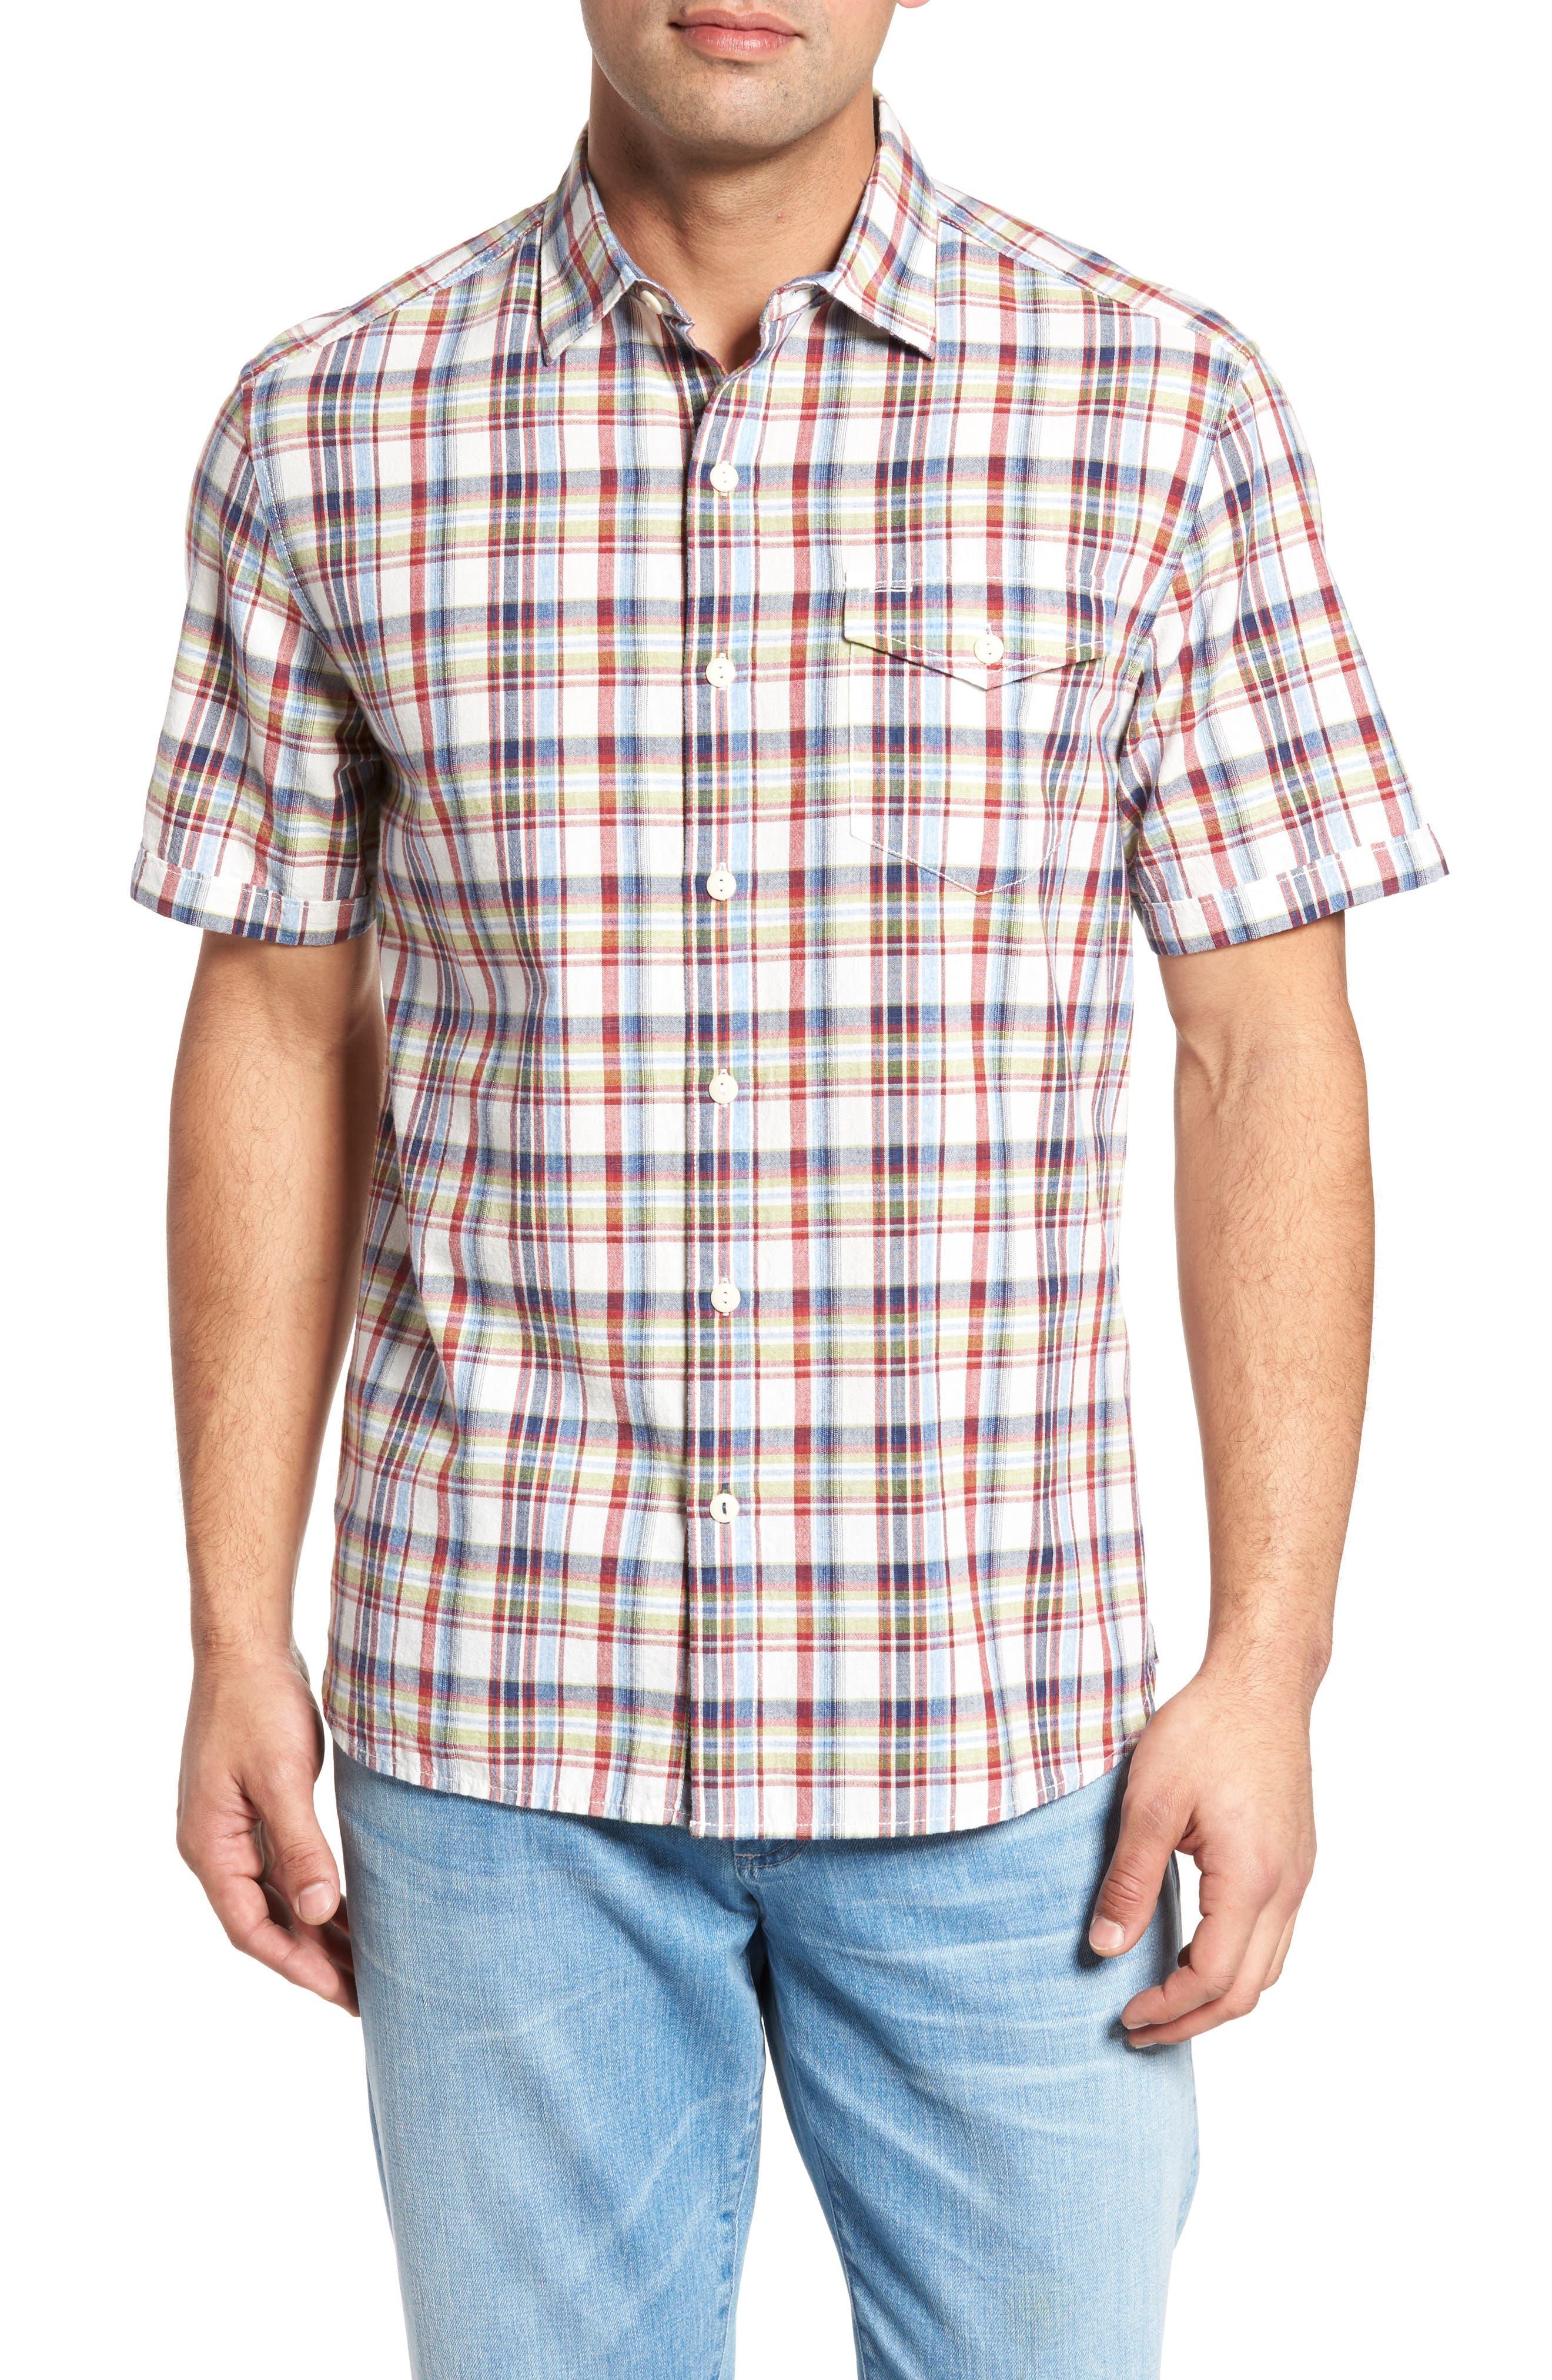 Ocean Cay Plaid Sport Shirt,                         Main,                         color, Kingdom Blue